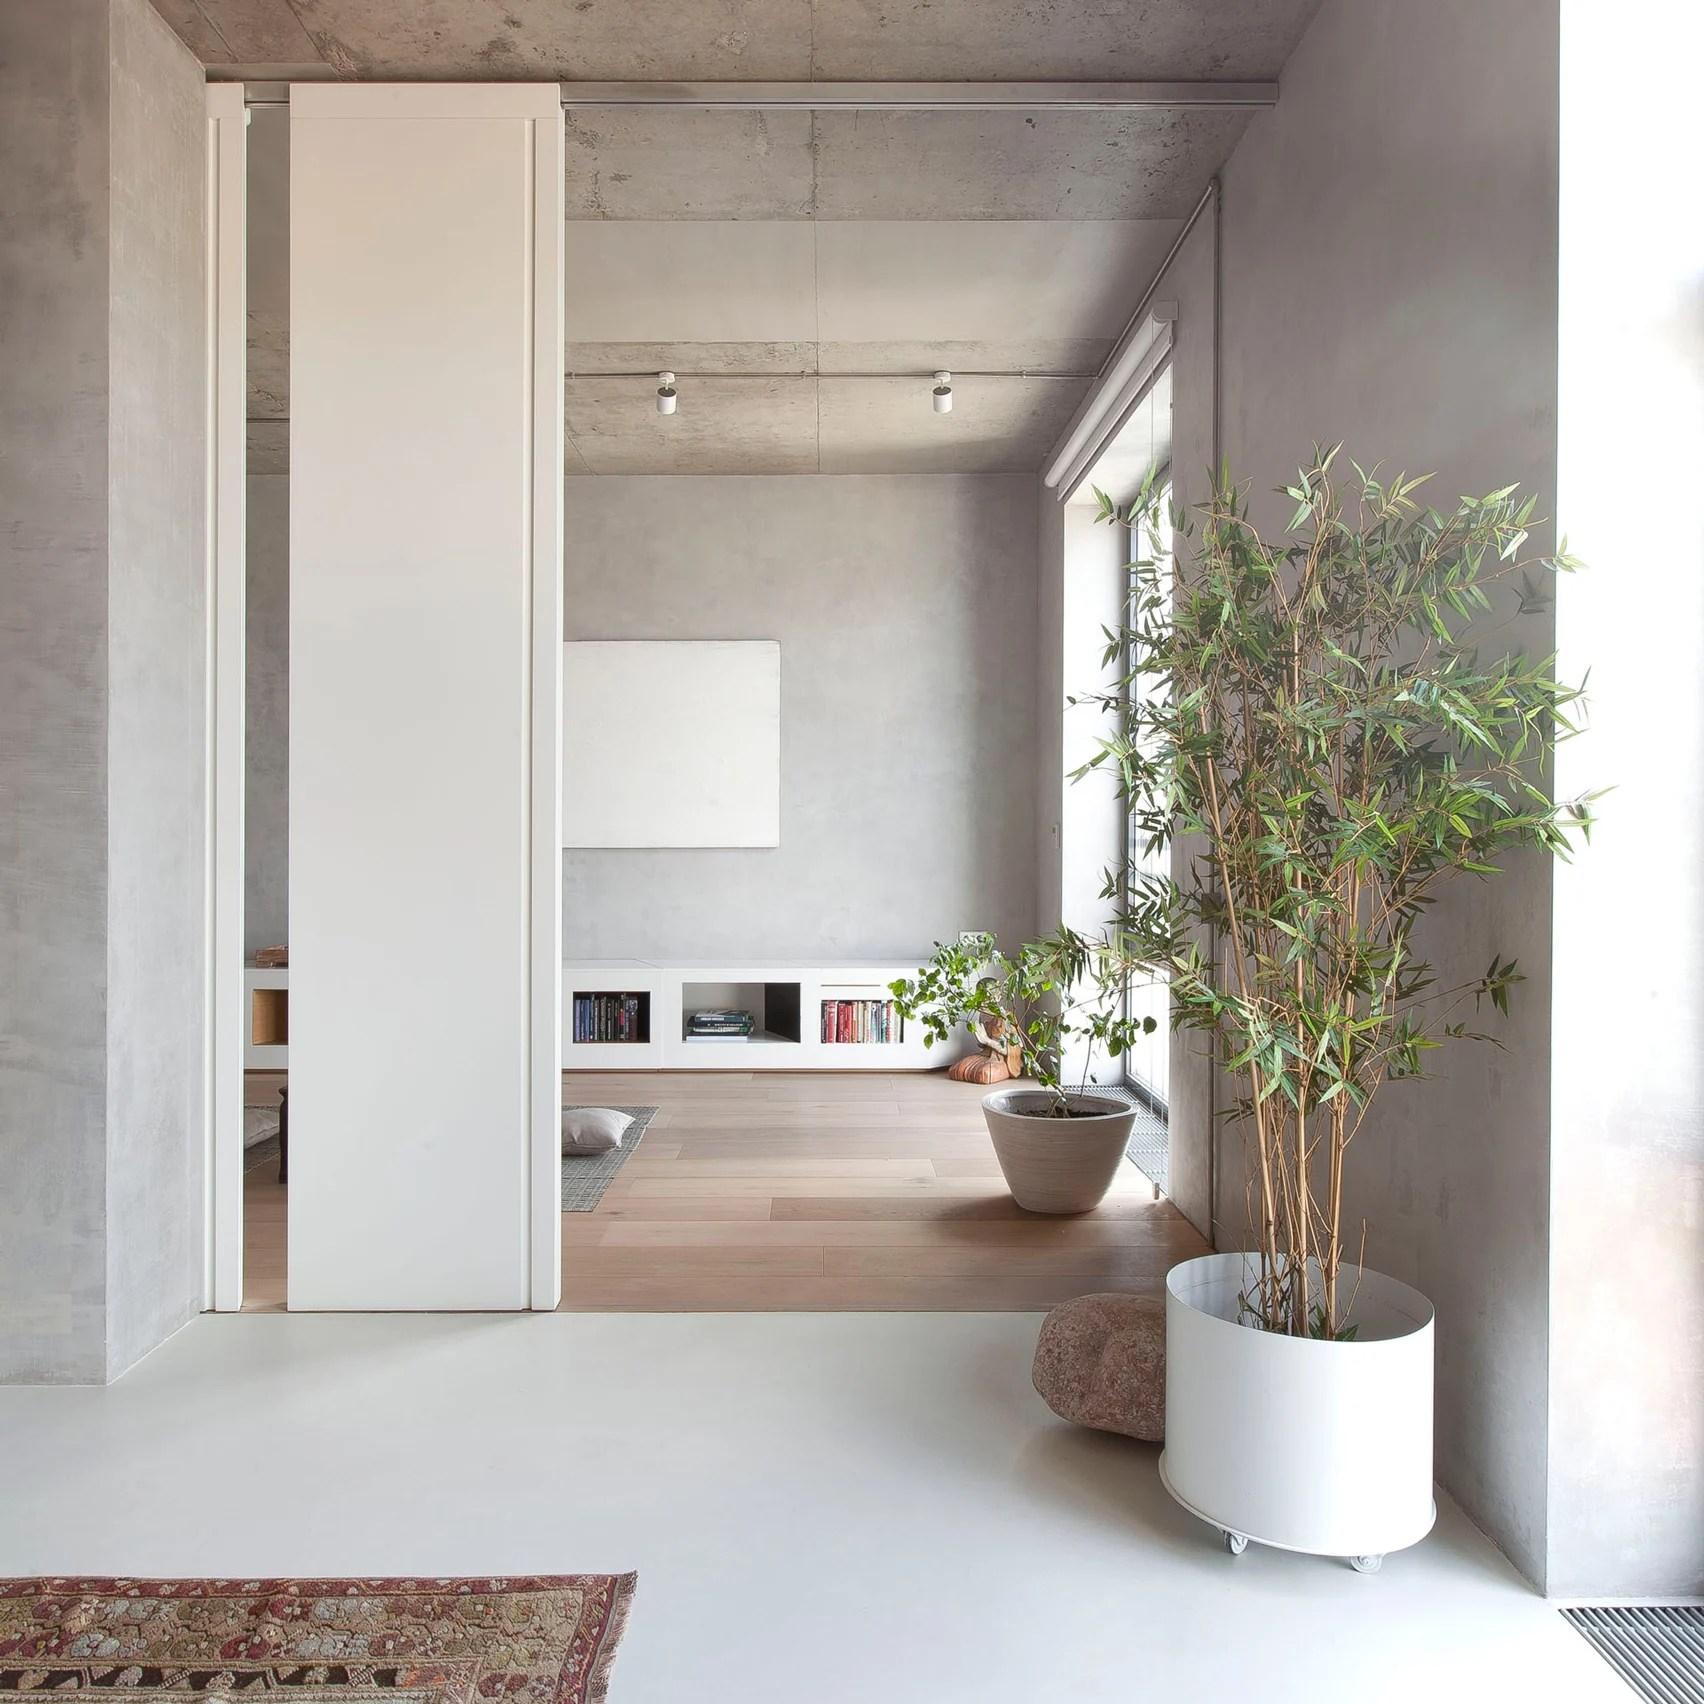 10 Japanesethemed interiors from Dezeens Pinterest boards